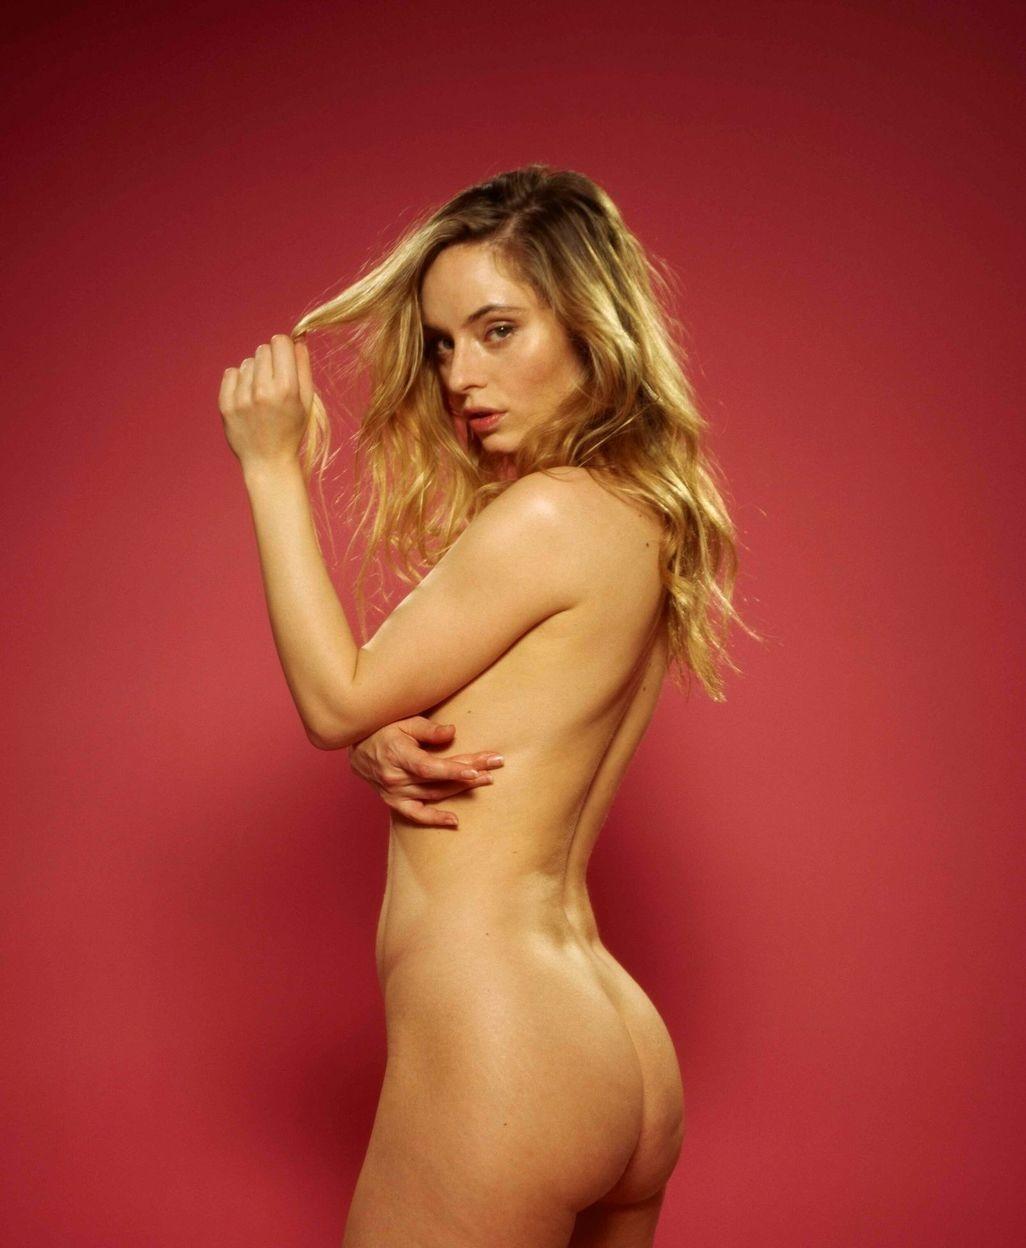 maria kn Mode nude